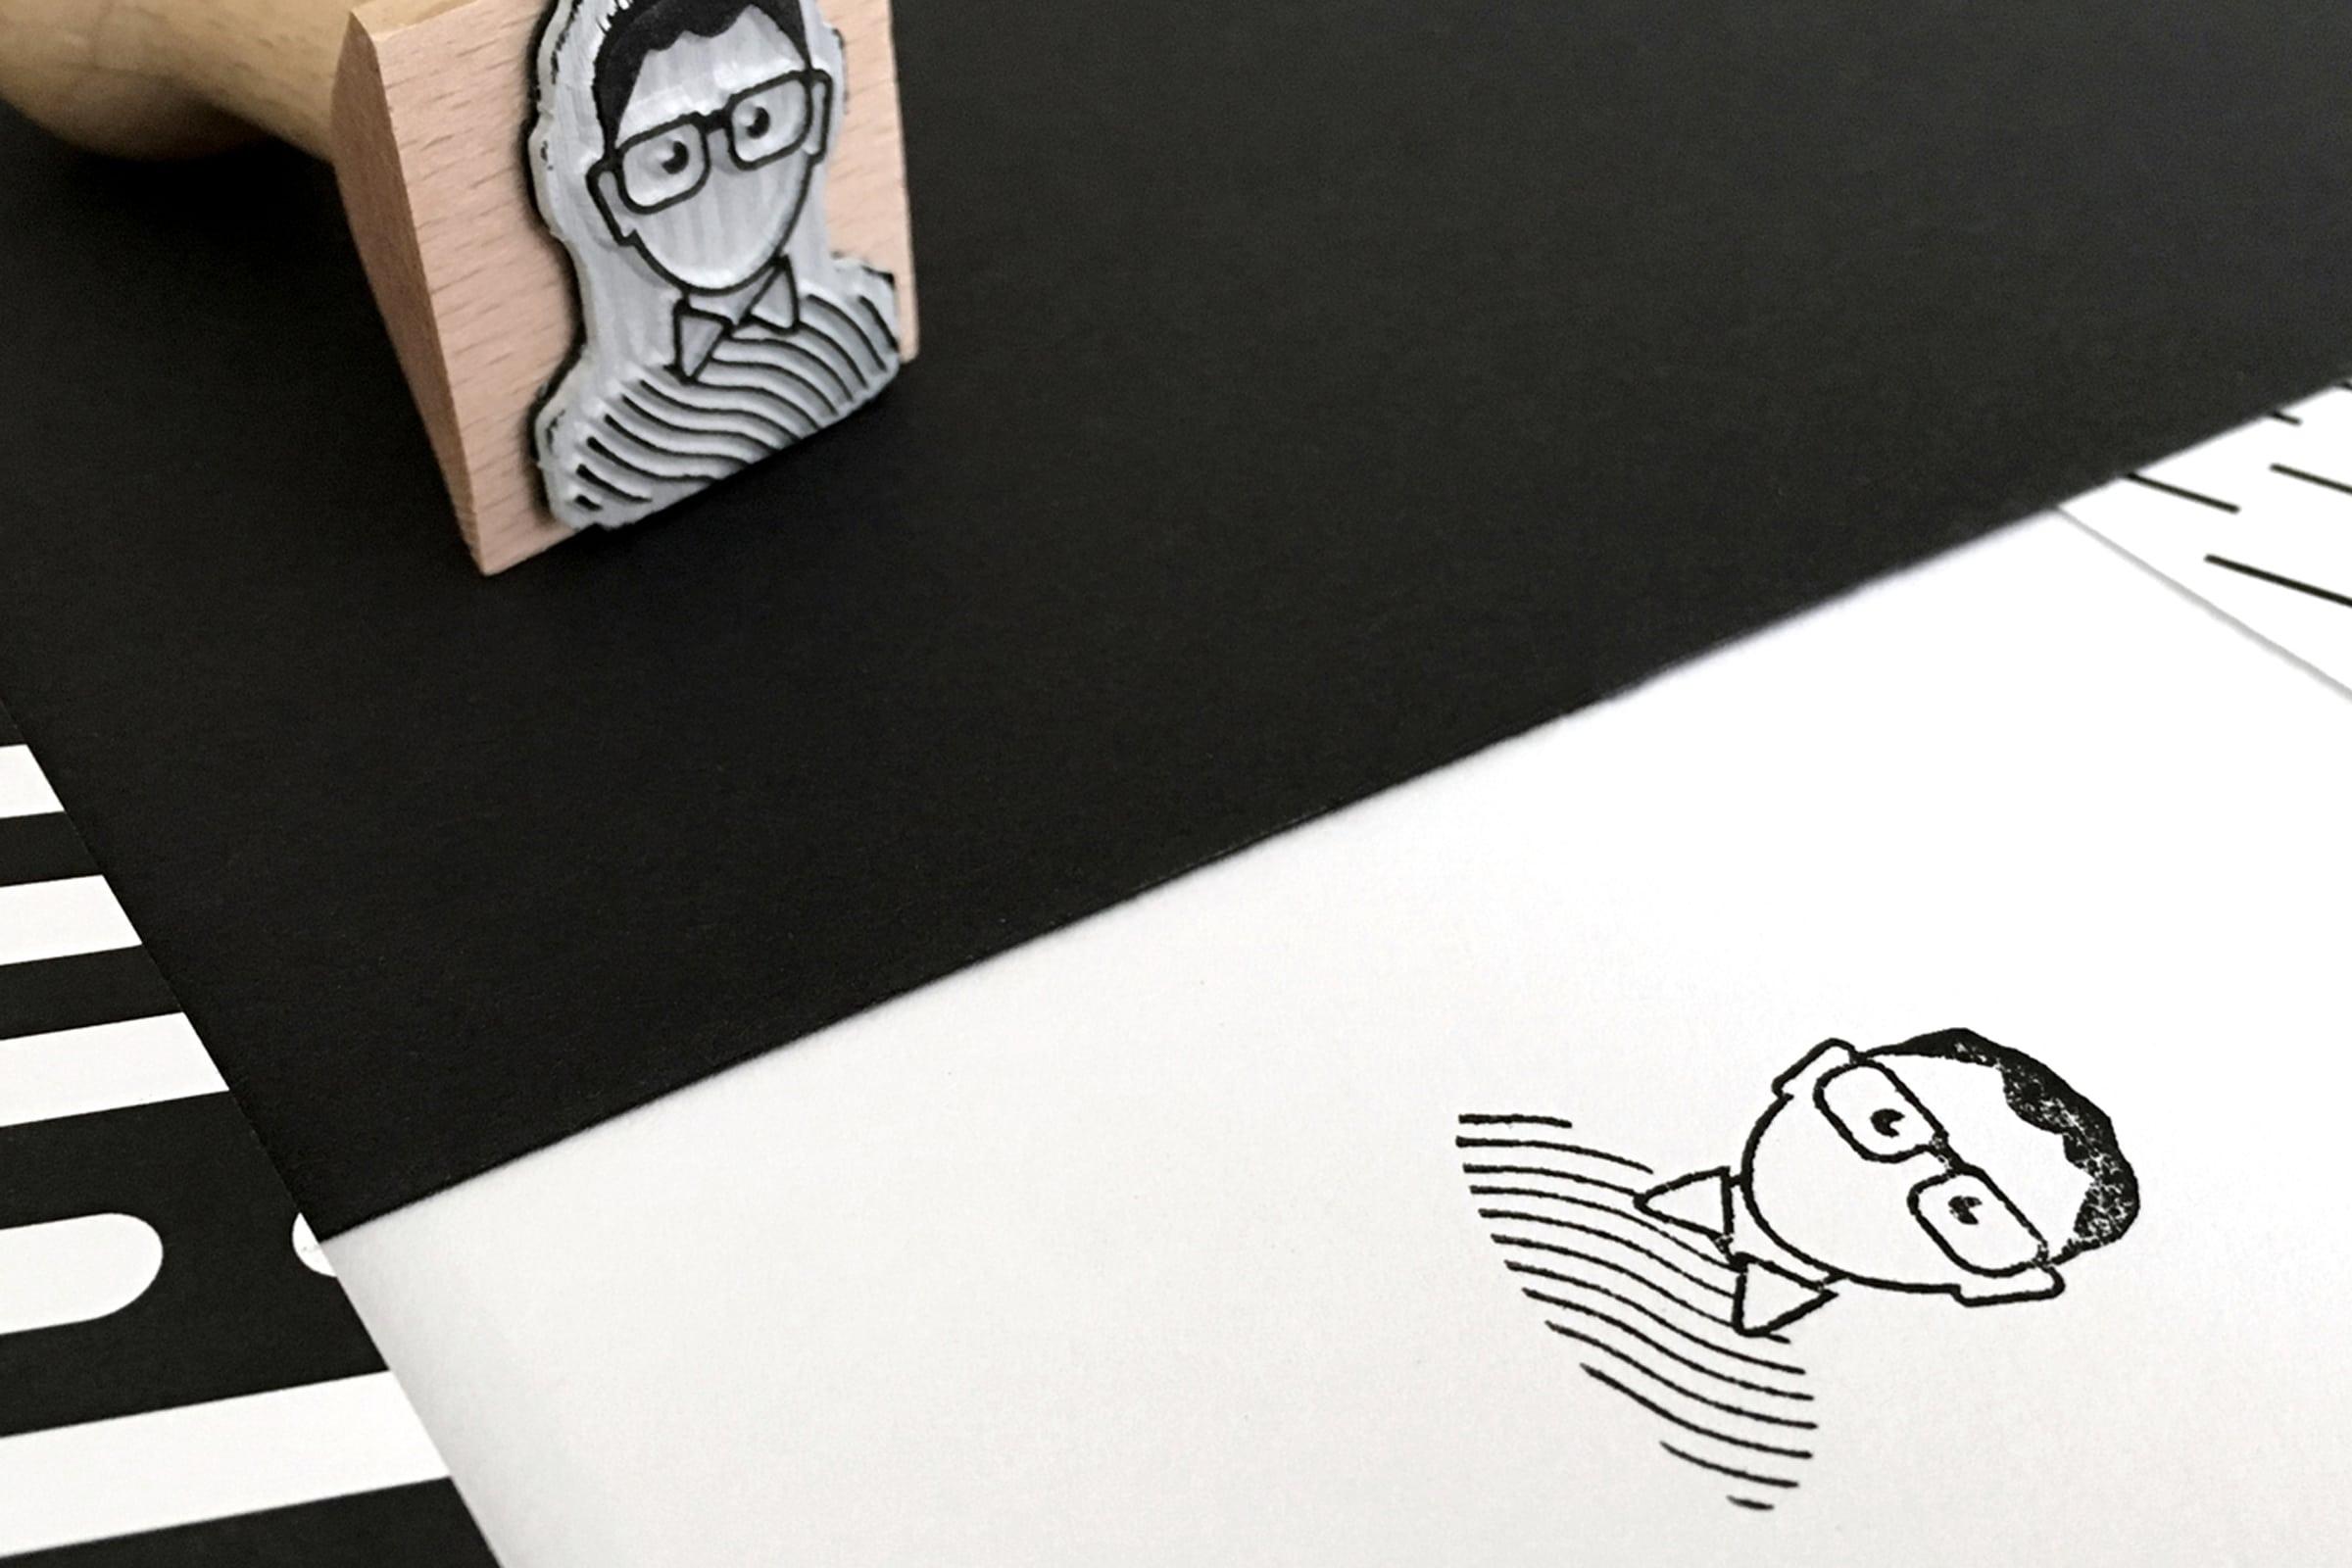 KieferNümann, Stemepl, Illustration, Design